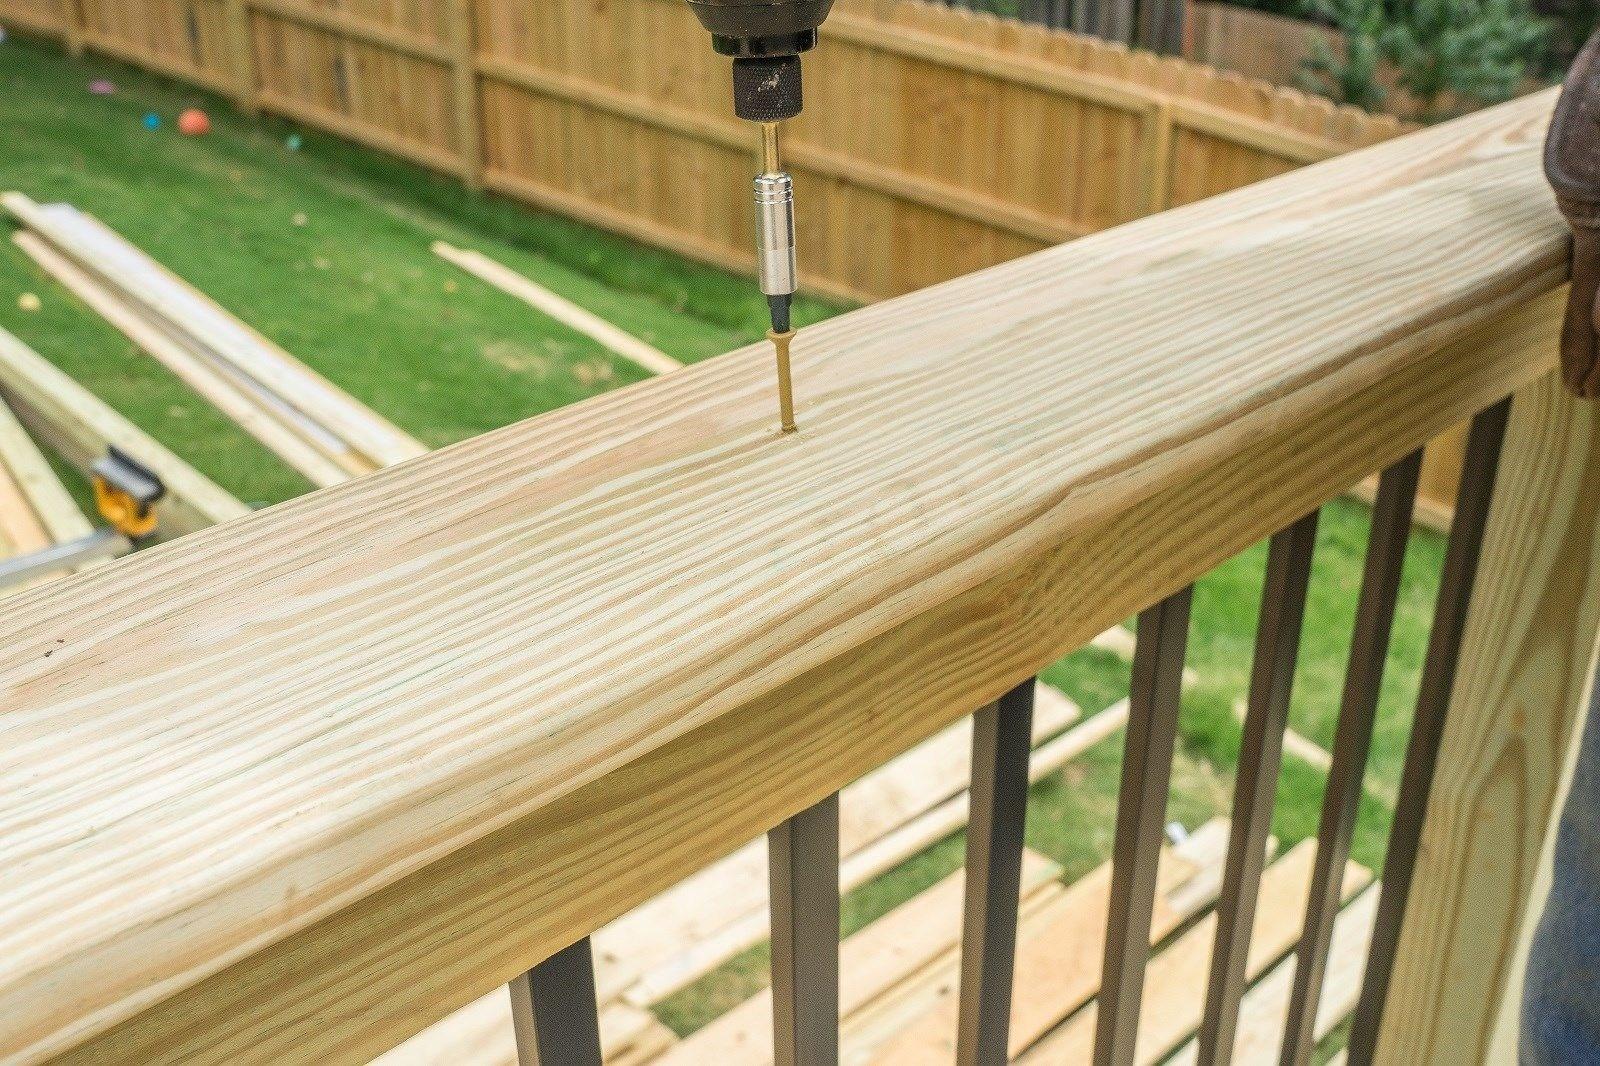 Railing Cap Decks Com | 2 Inch Round Wood Handrail | Stair Parts | Outside Diameter | Stair Treads | Handrail Brackets | Oak Wood